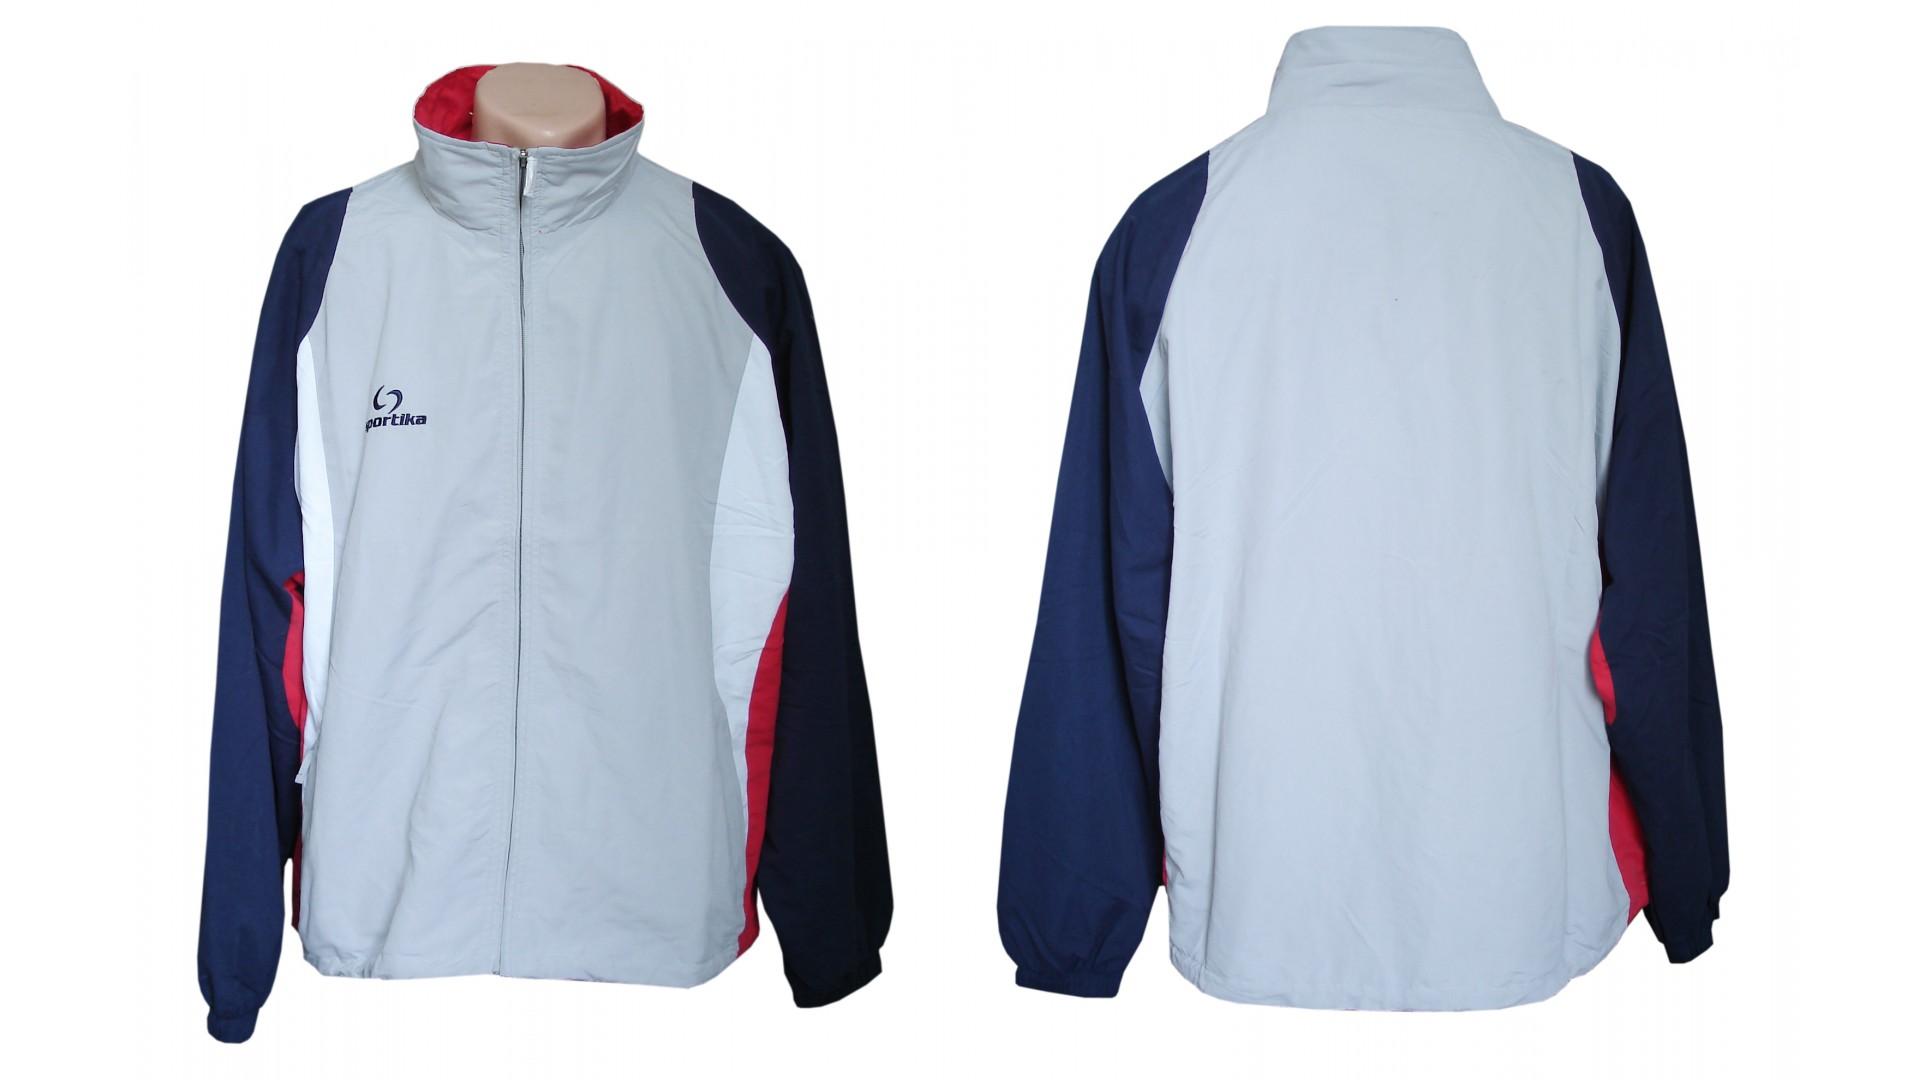 Спортивный костюм Sportika куртка вид спереди и сзади